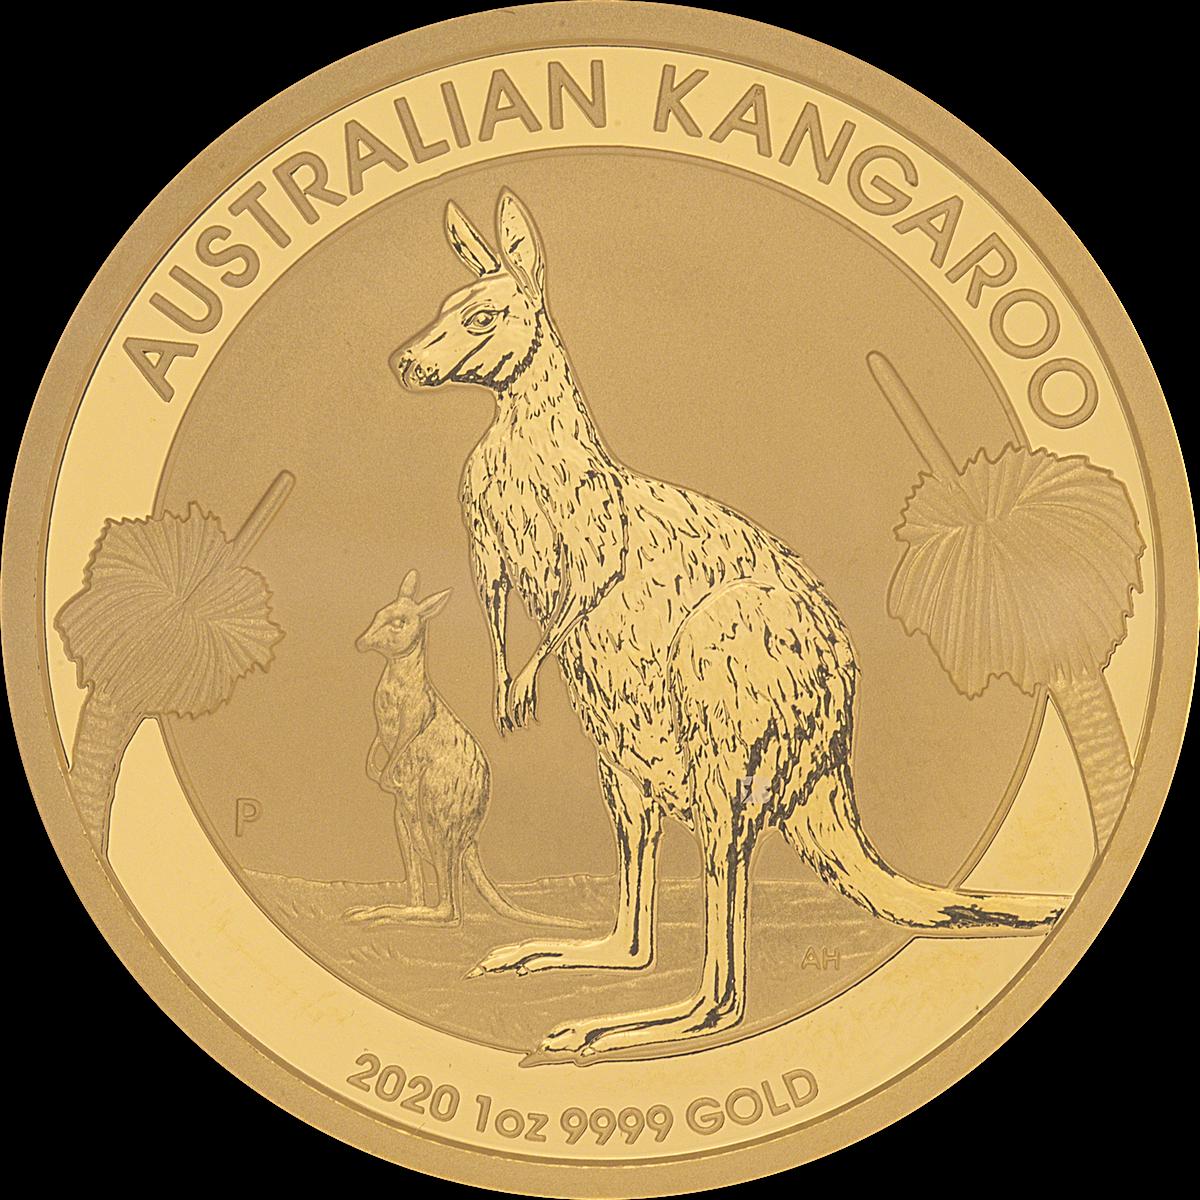 2020 Australian Gold Kangaroo - 1 Oz